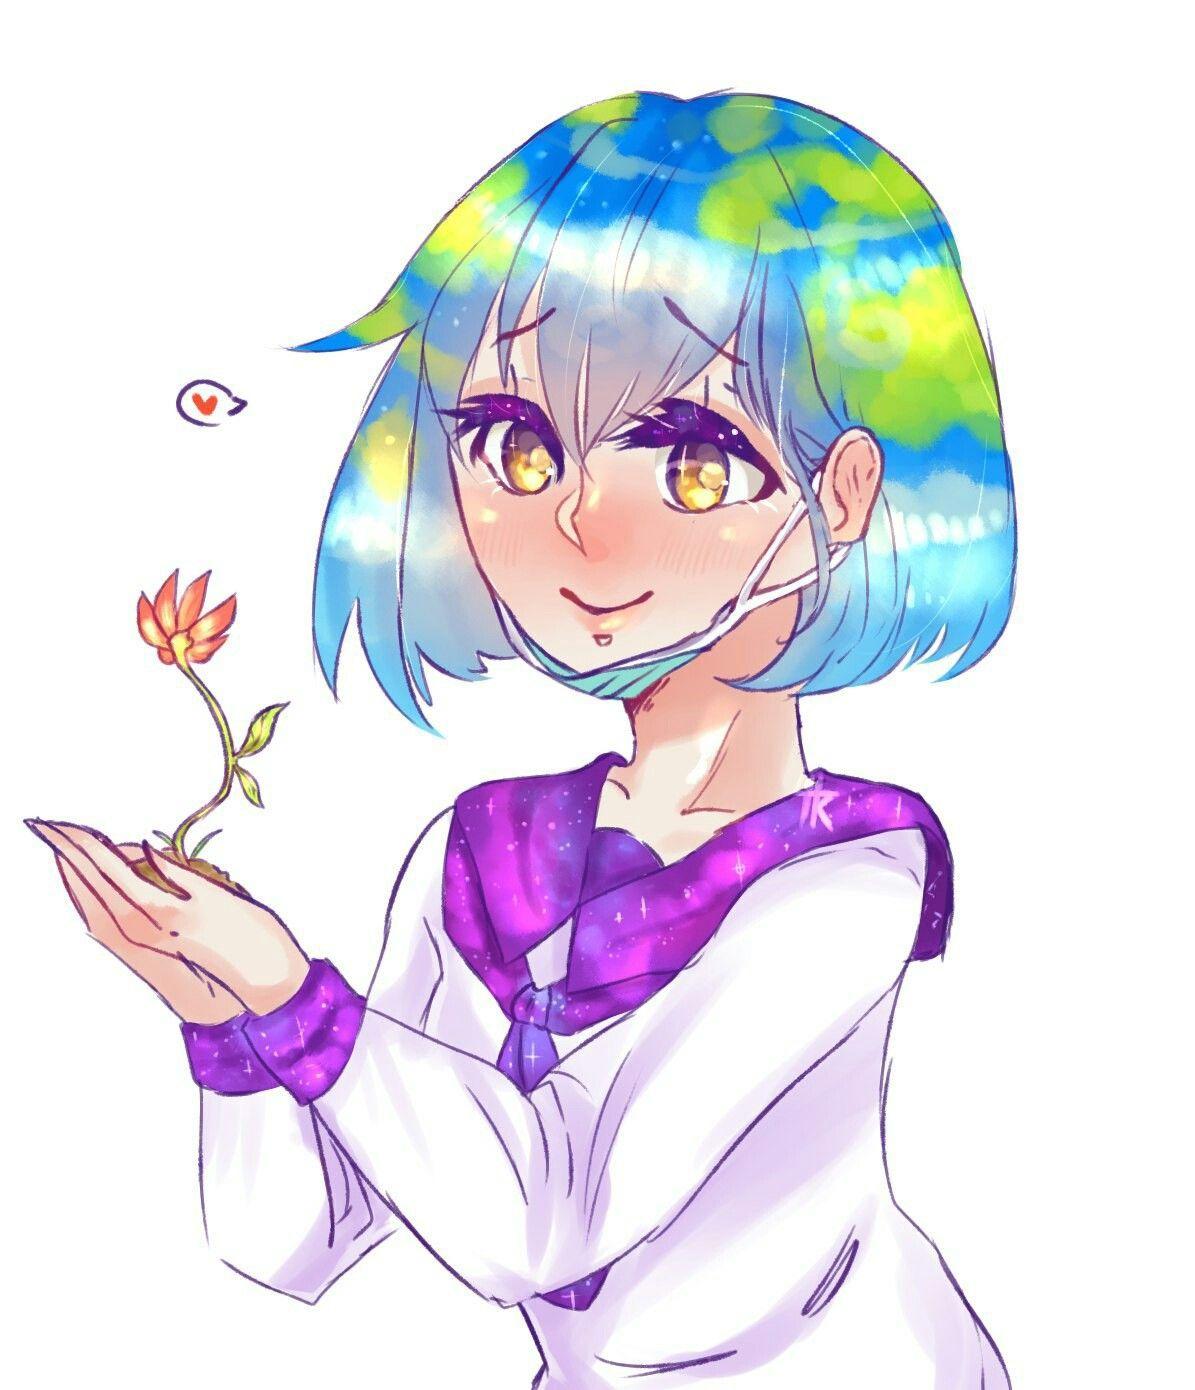 Похожее изображение Purple art, Anime, comics